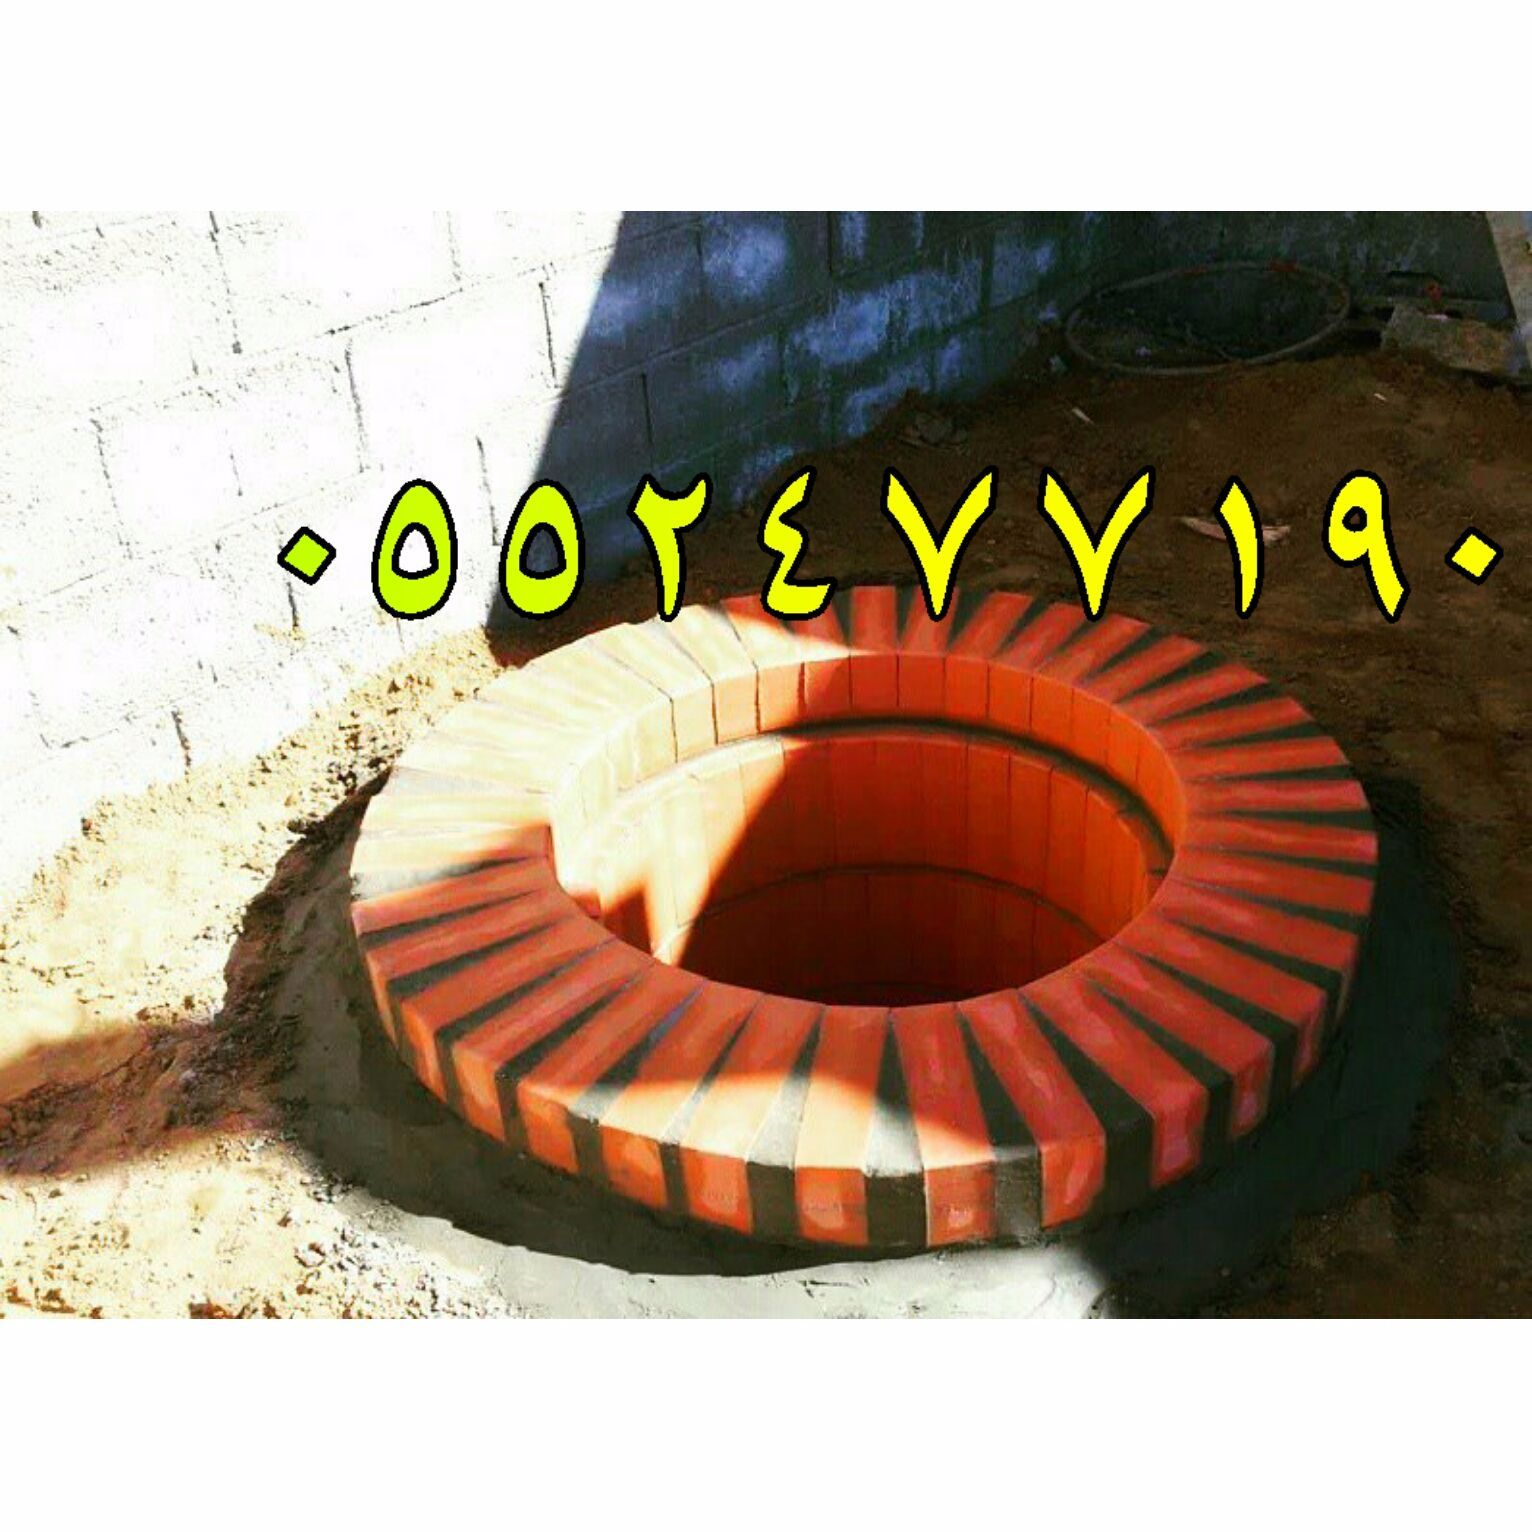 0d8787bd167077fcb6f40fbd7bf42d52 Incroyable De Parasols Castorama Conception